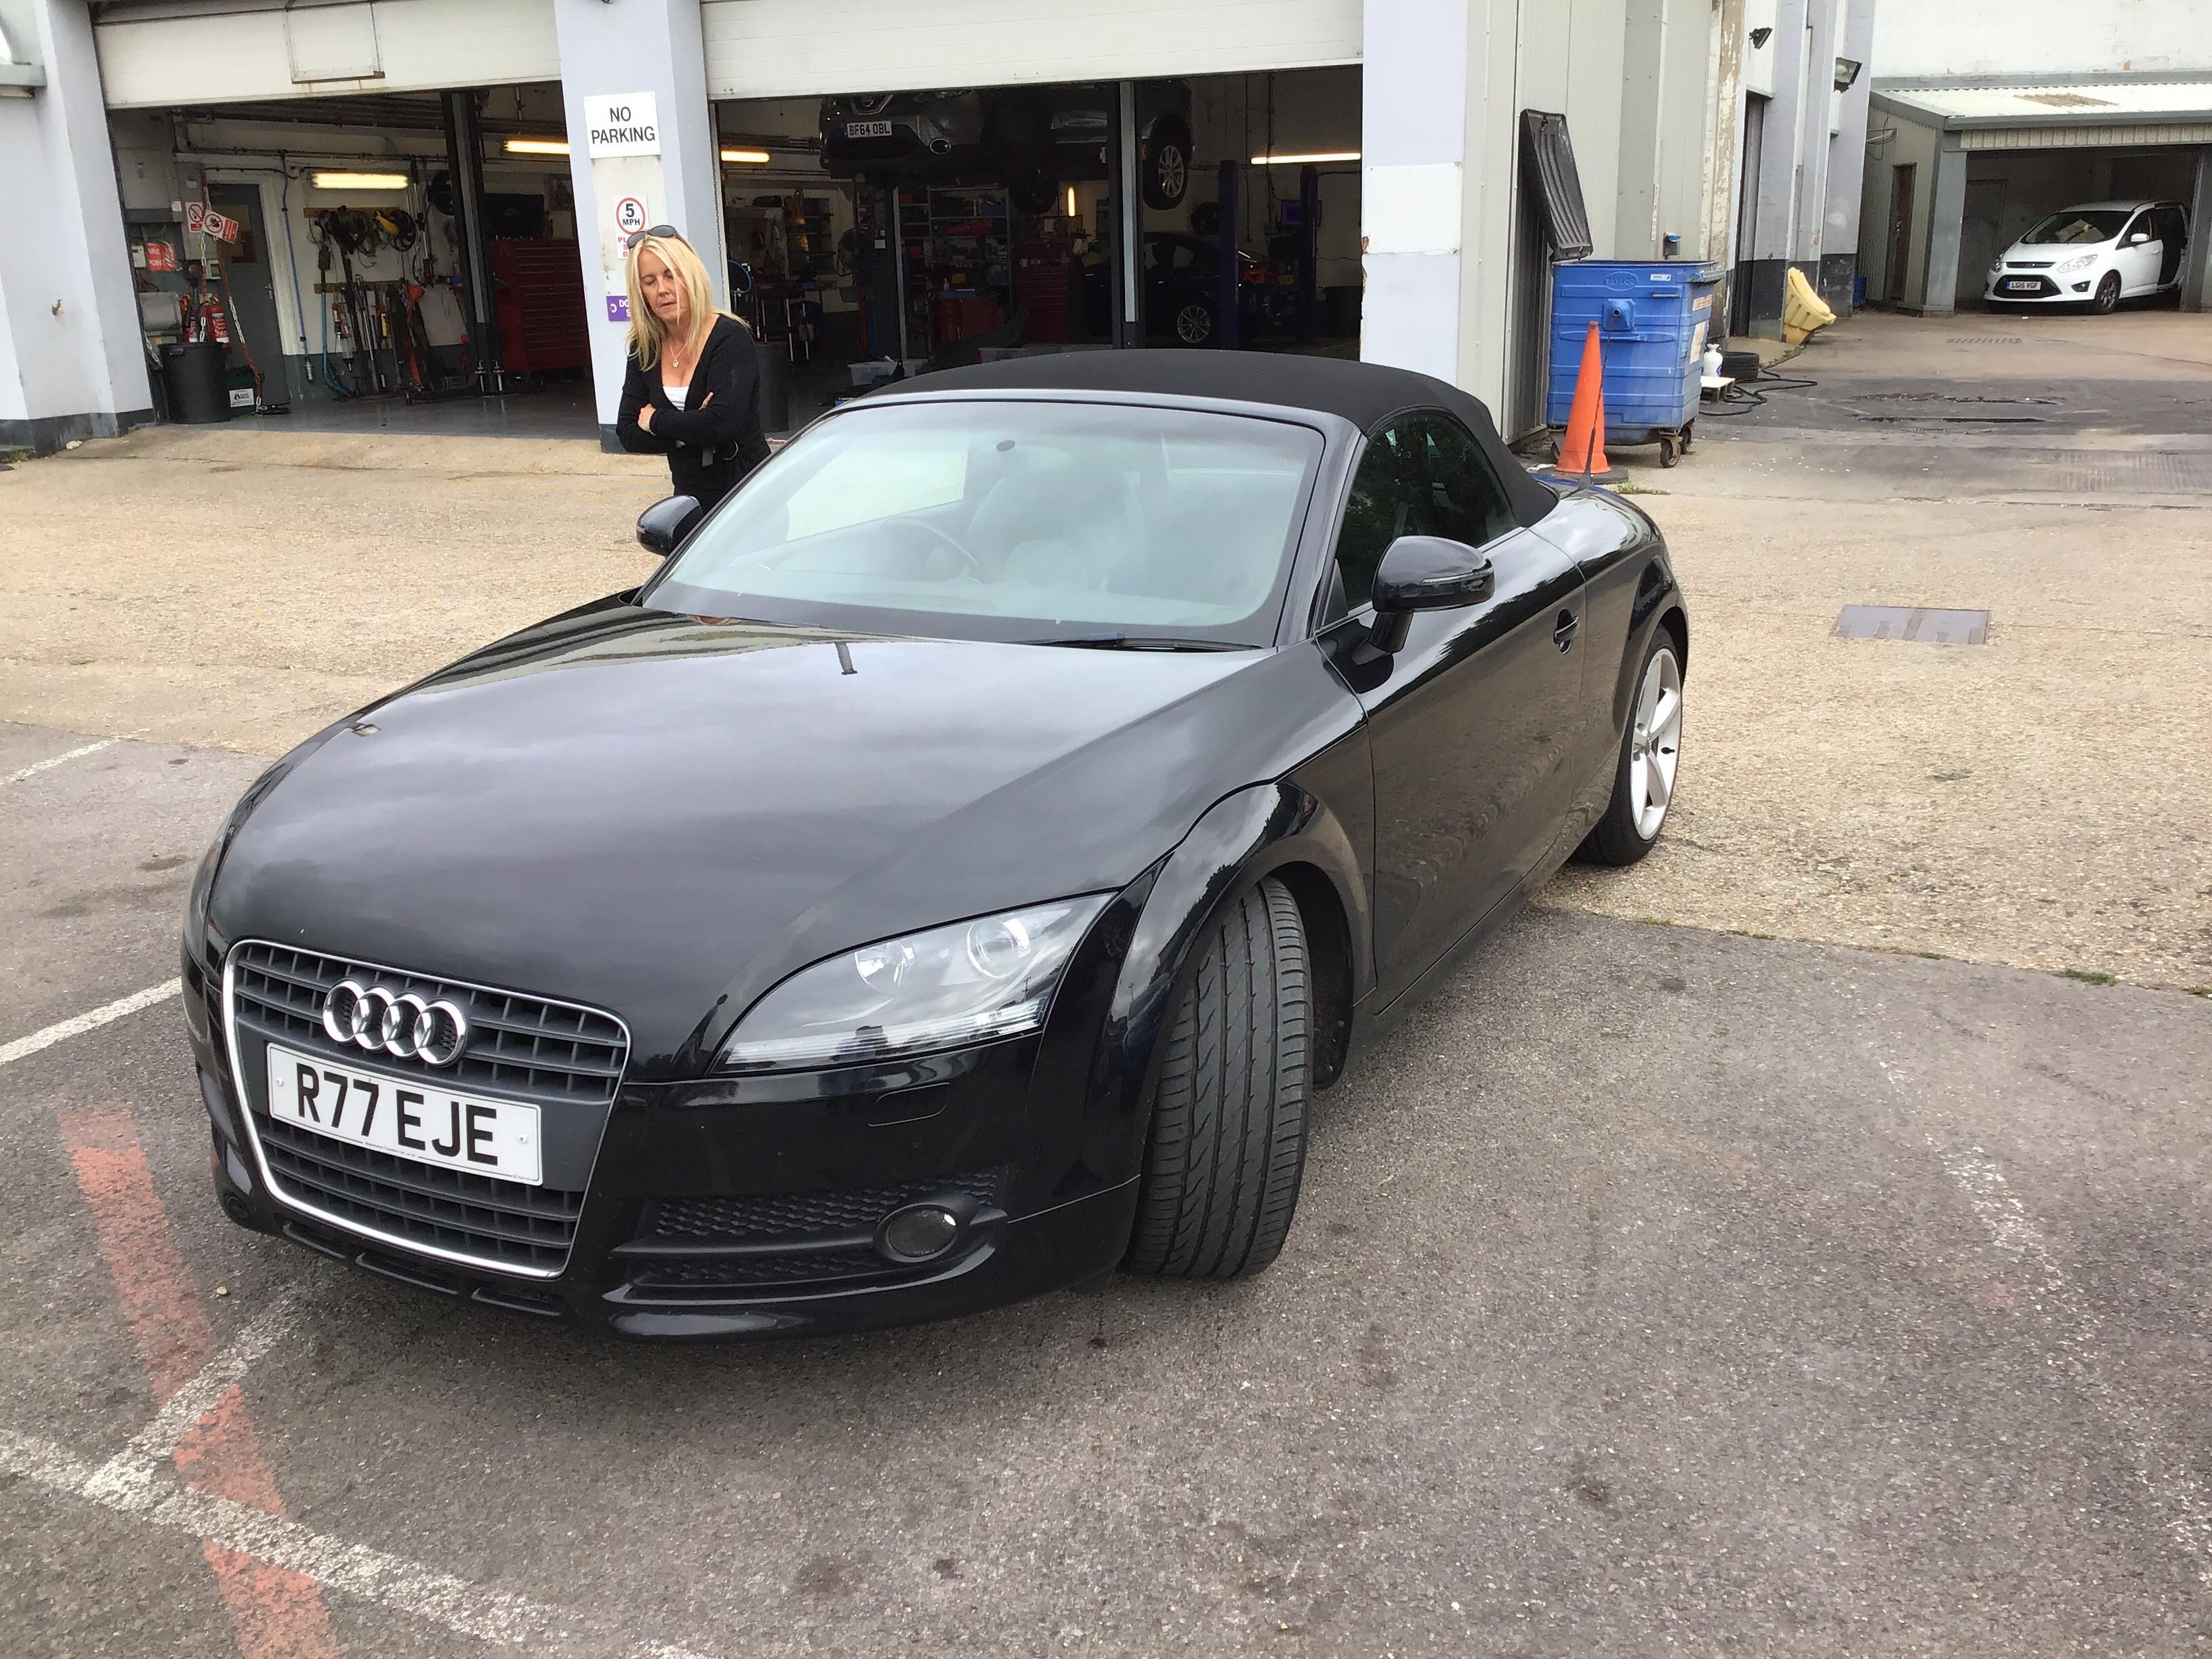 Audi TT 2.0T FSI 2dr Exterior 1